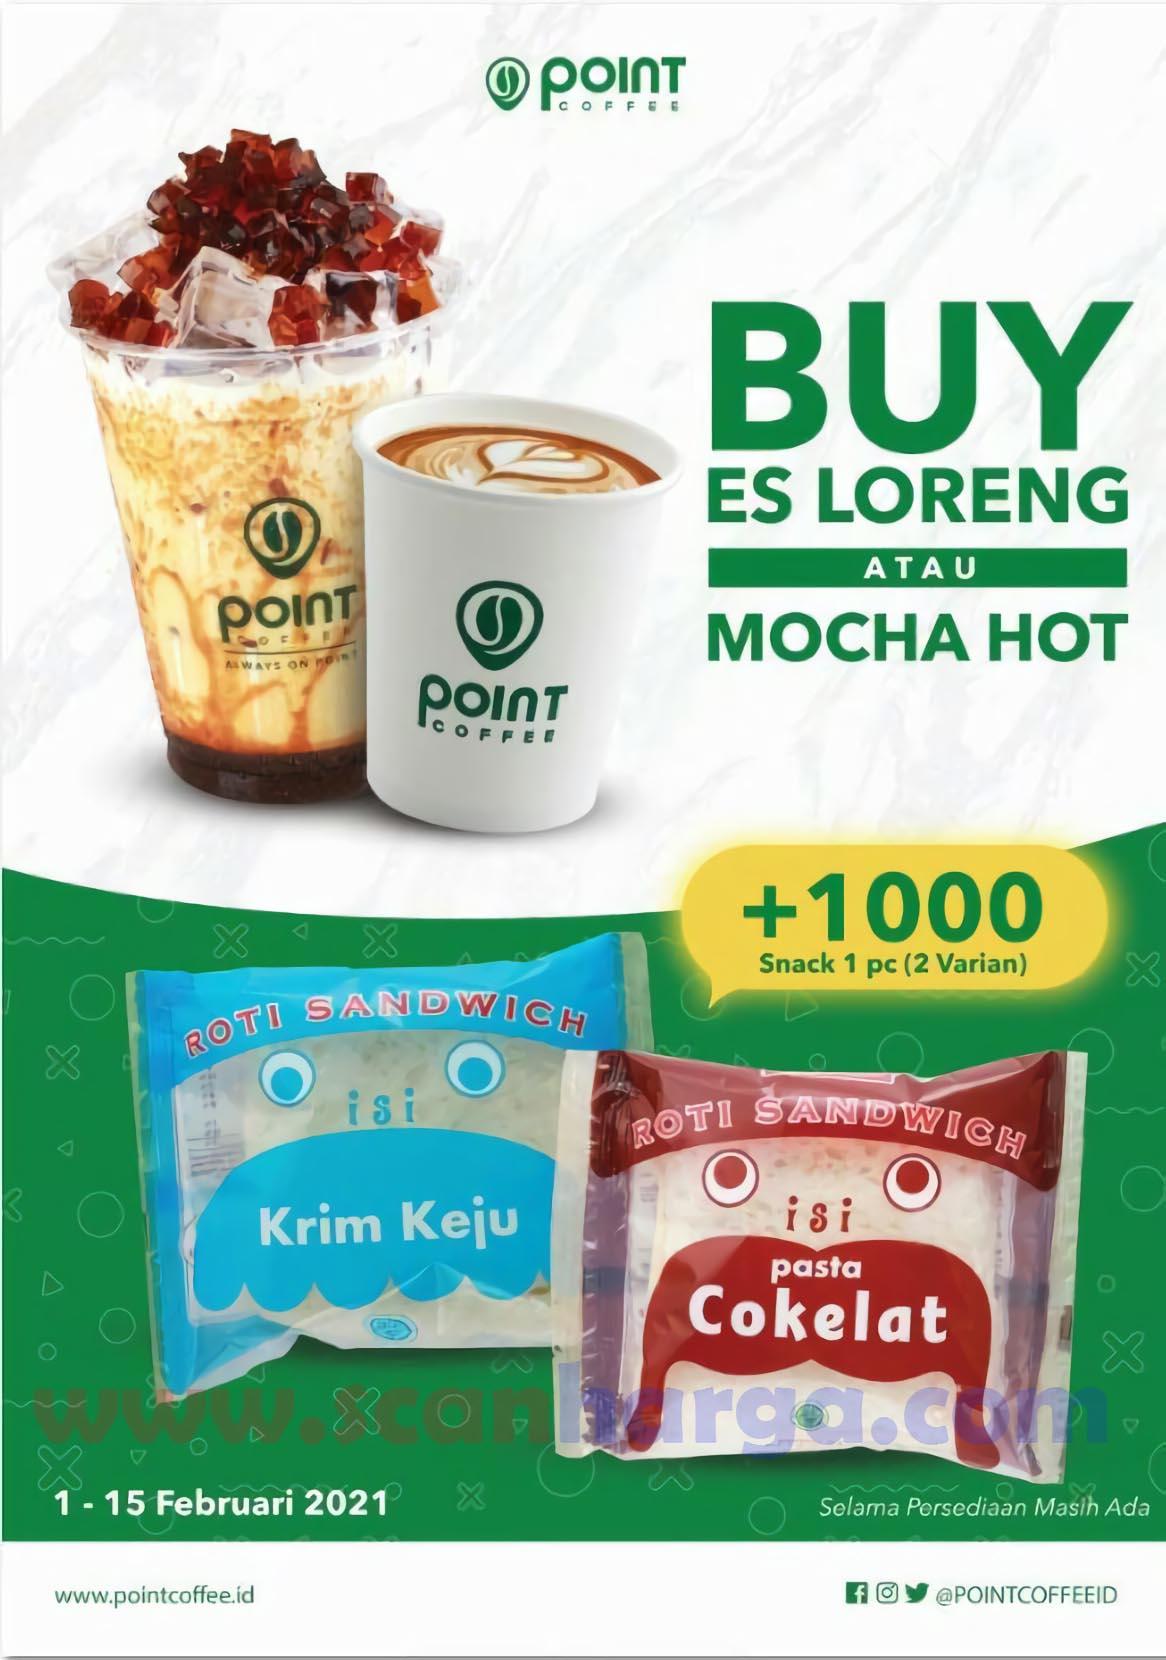 POINT COFFEE Promo Beli ES LORENG atau MOCHA HOT! +Rp 1.000 Dapat Snack 1 PCS (2 Varian)